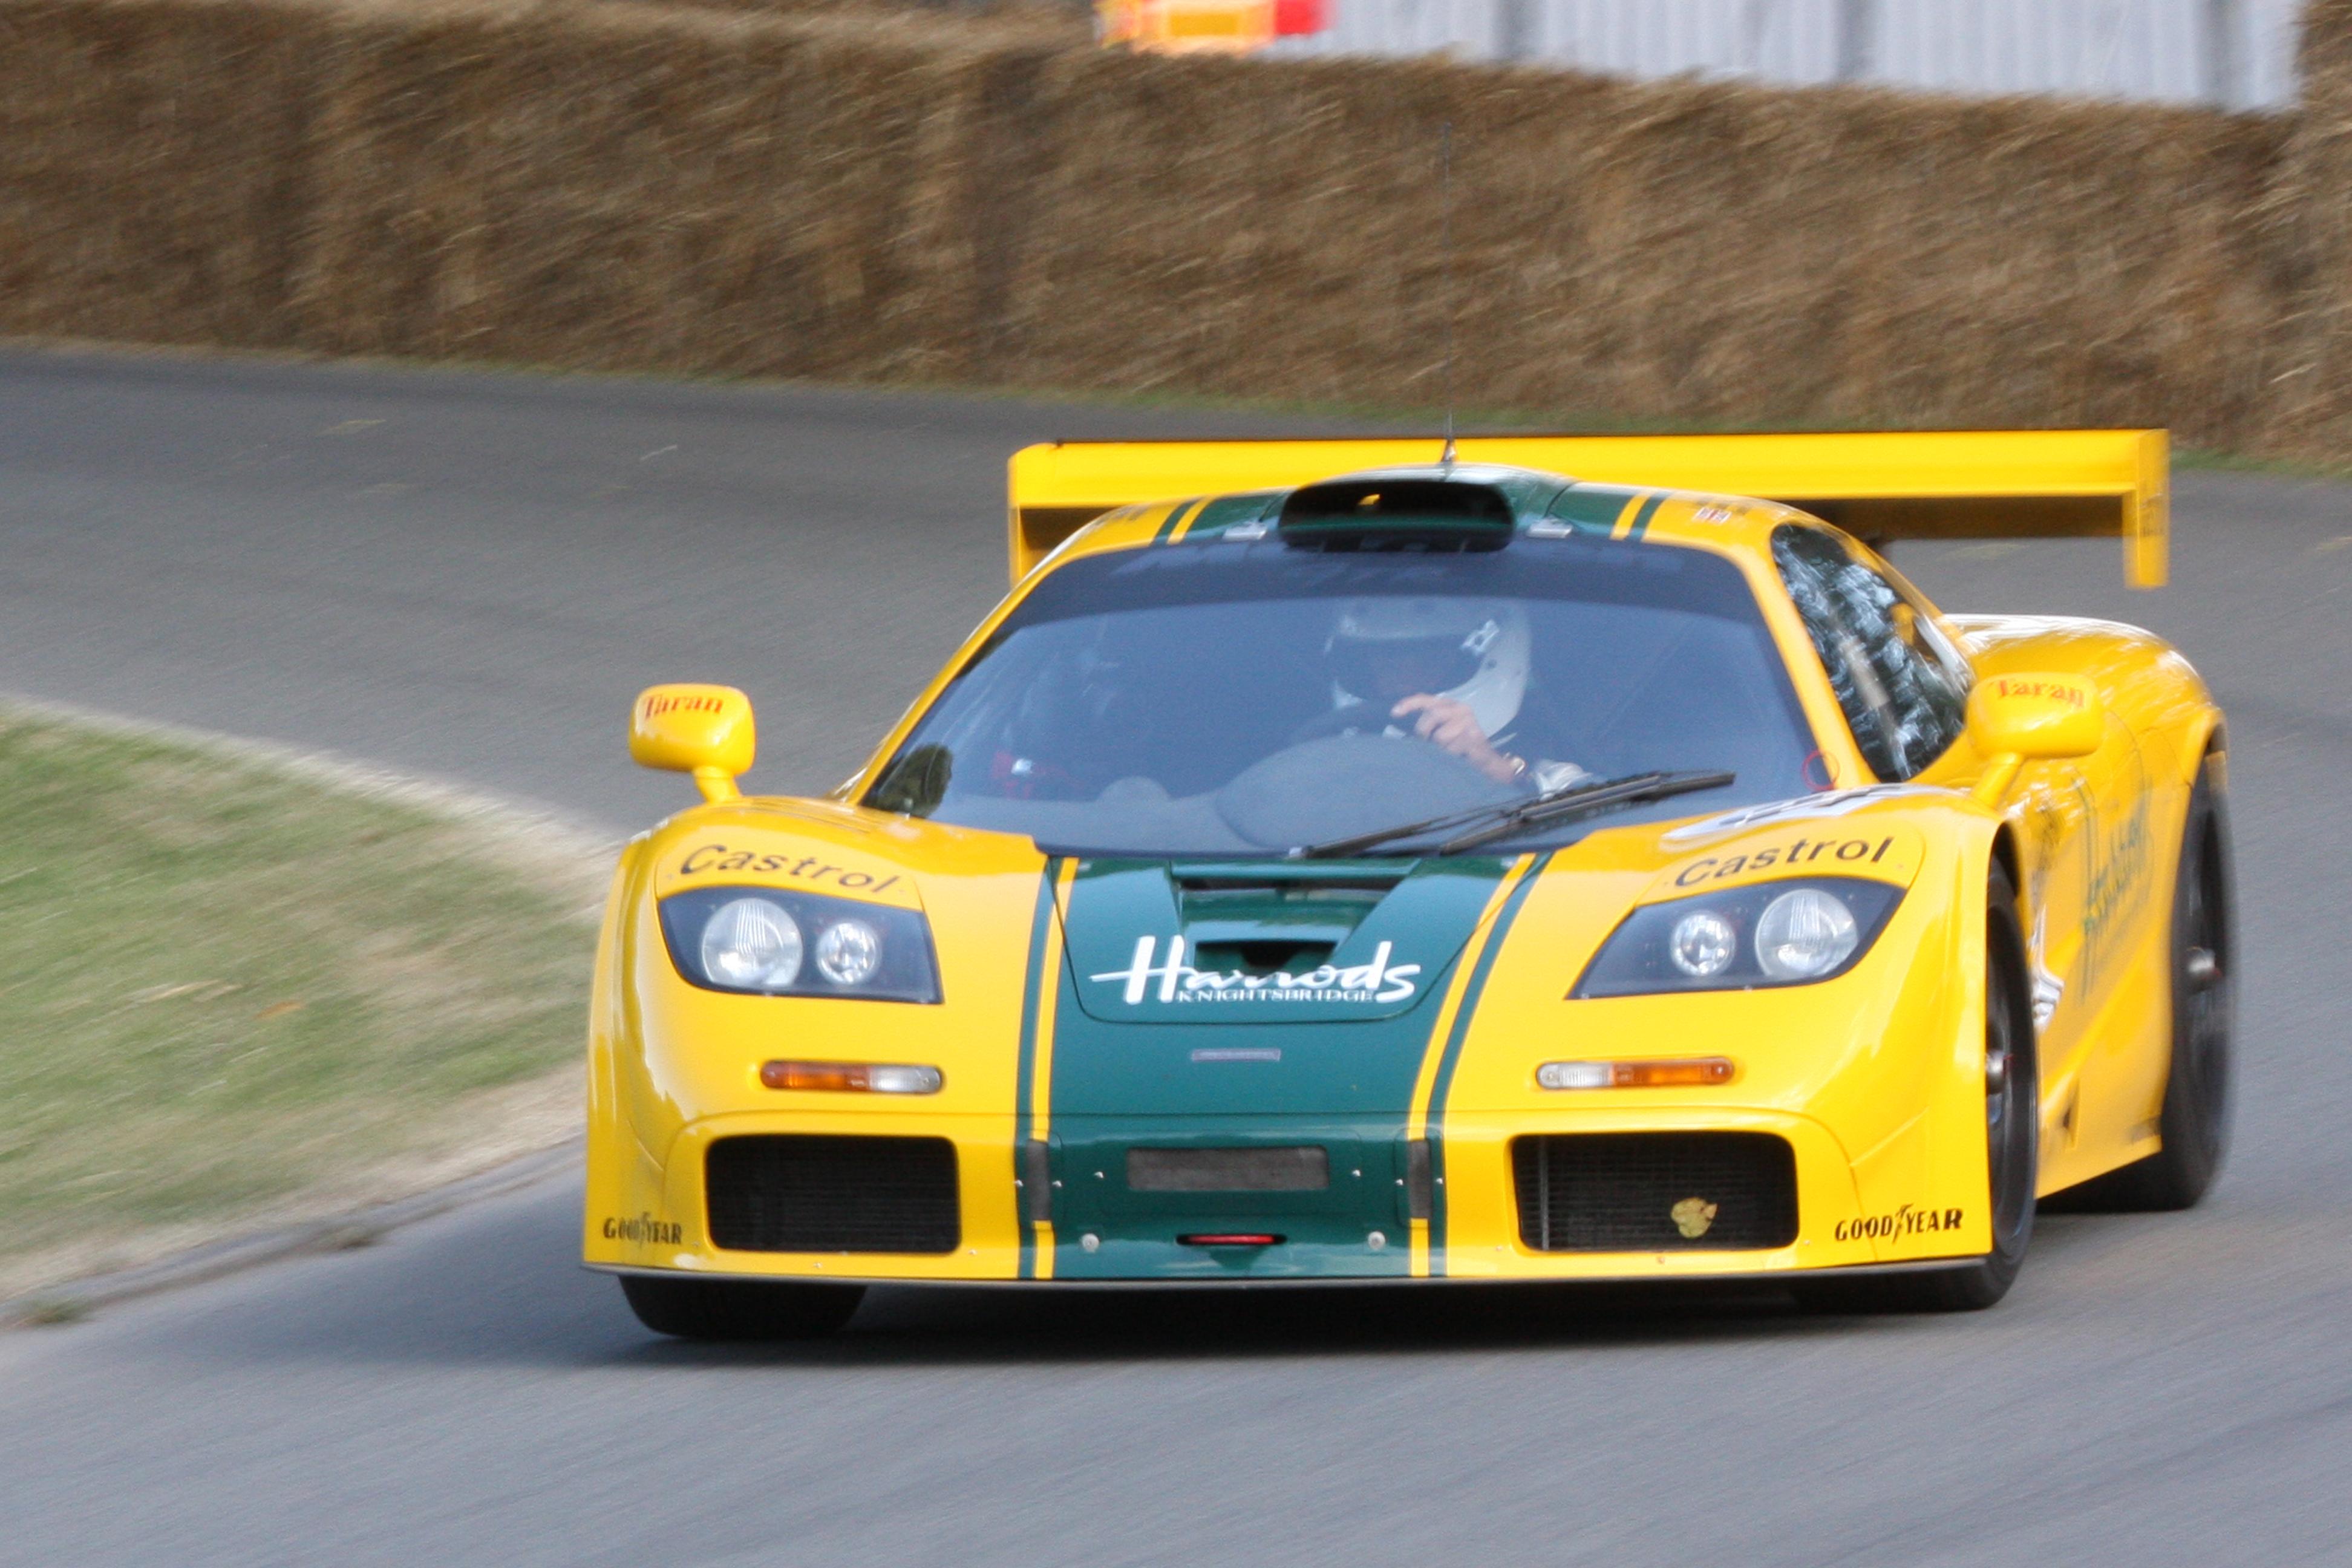 https://upload.wikimedia.org/wikipedia/commons/6/67/1995_McLaren-BMW_F1_GTR_-_Flickr_-_exfordy.jpg